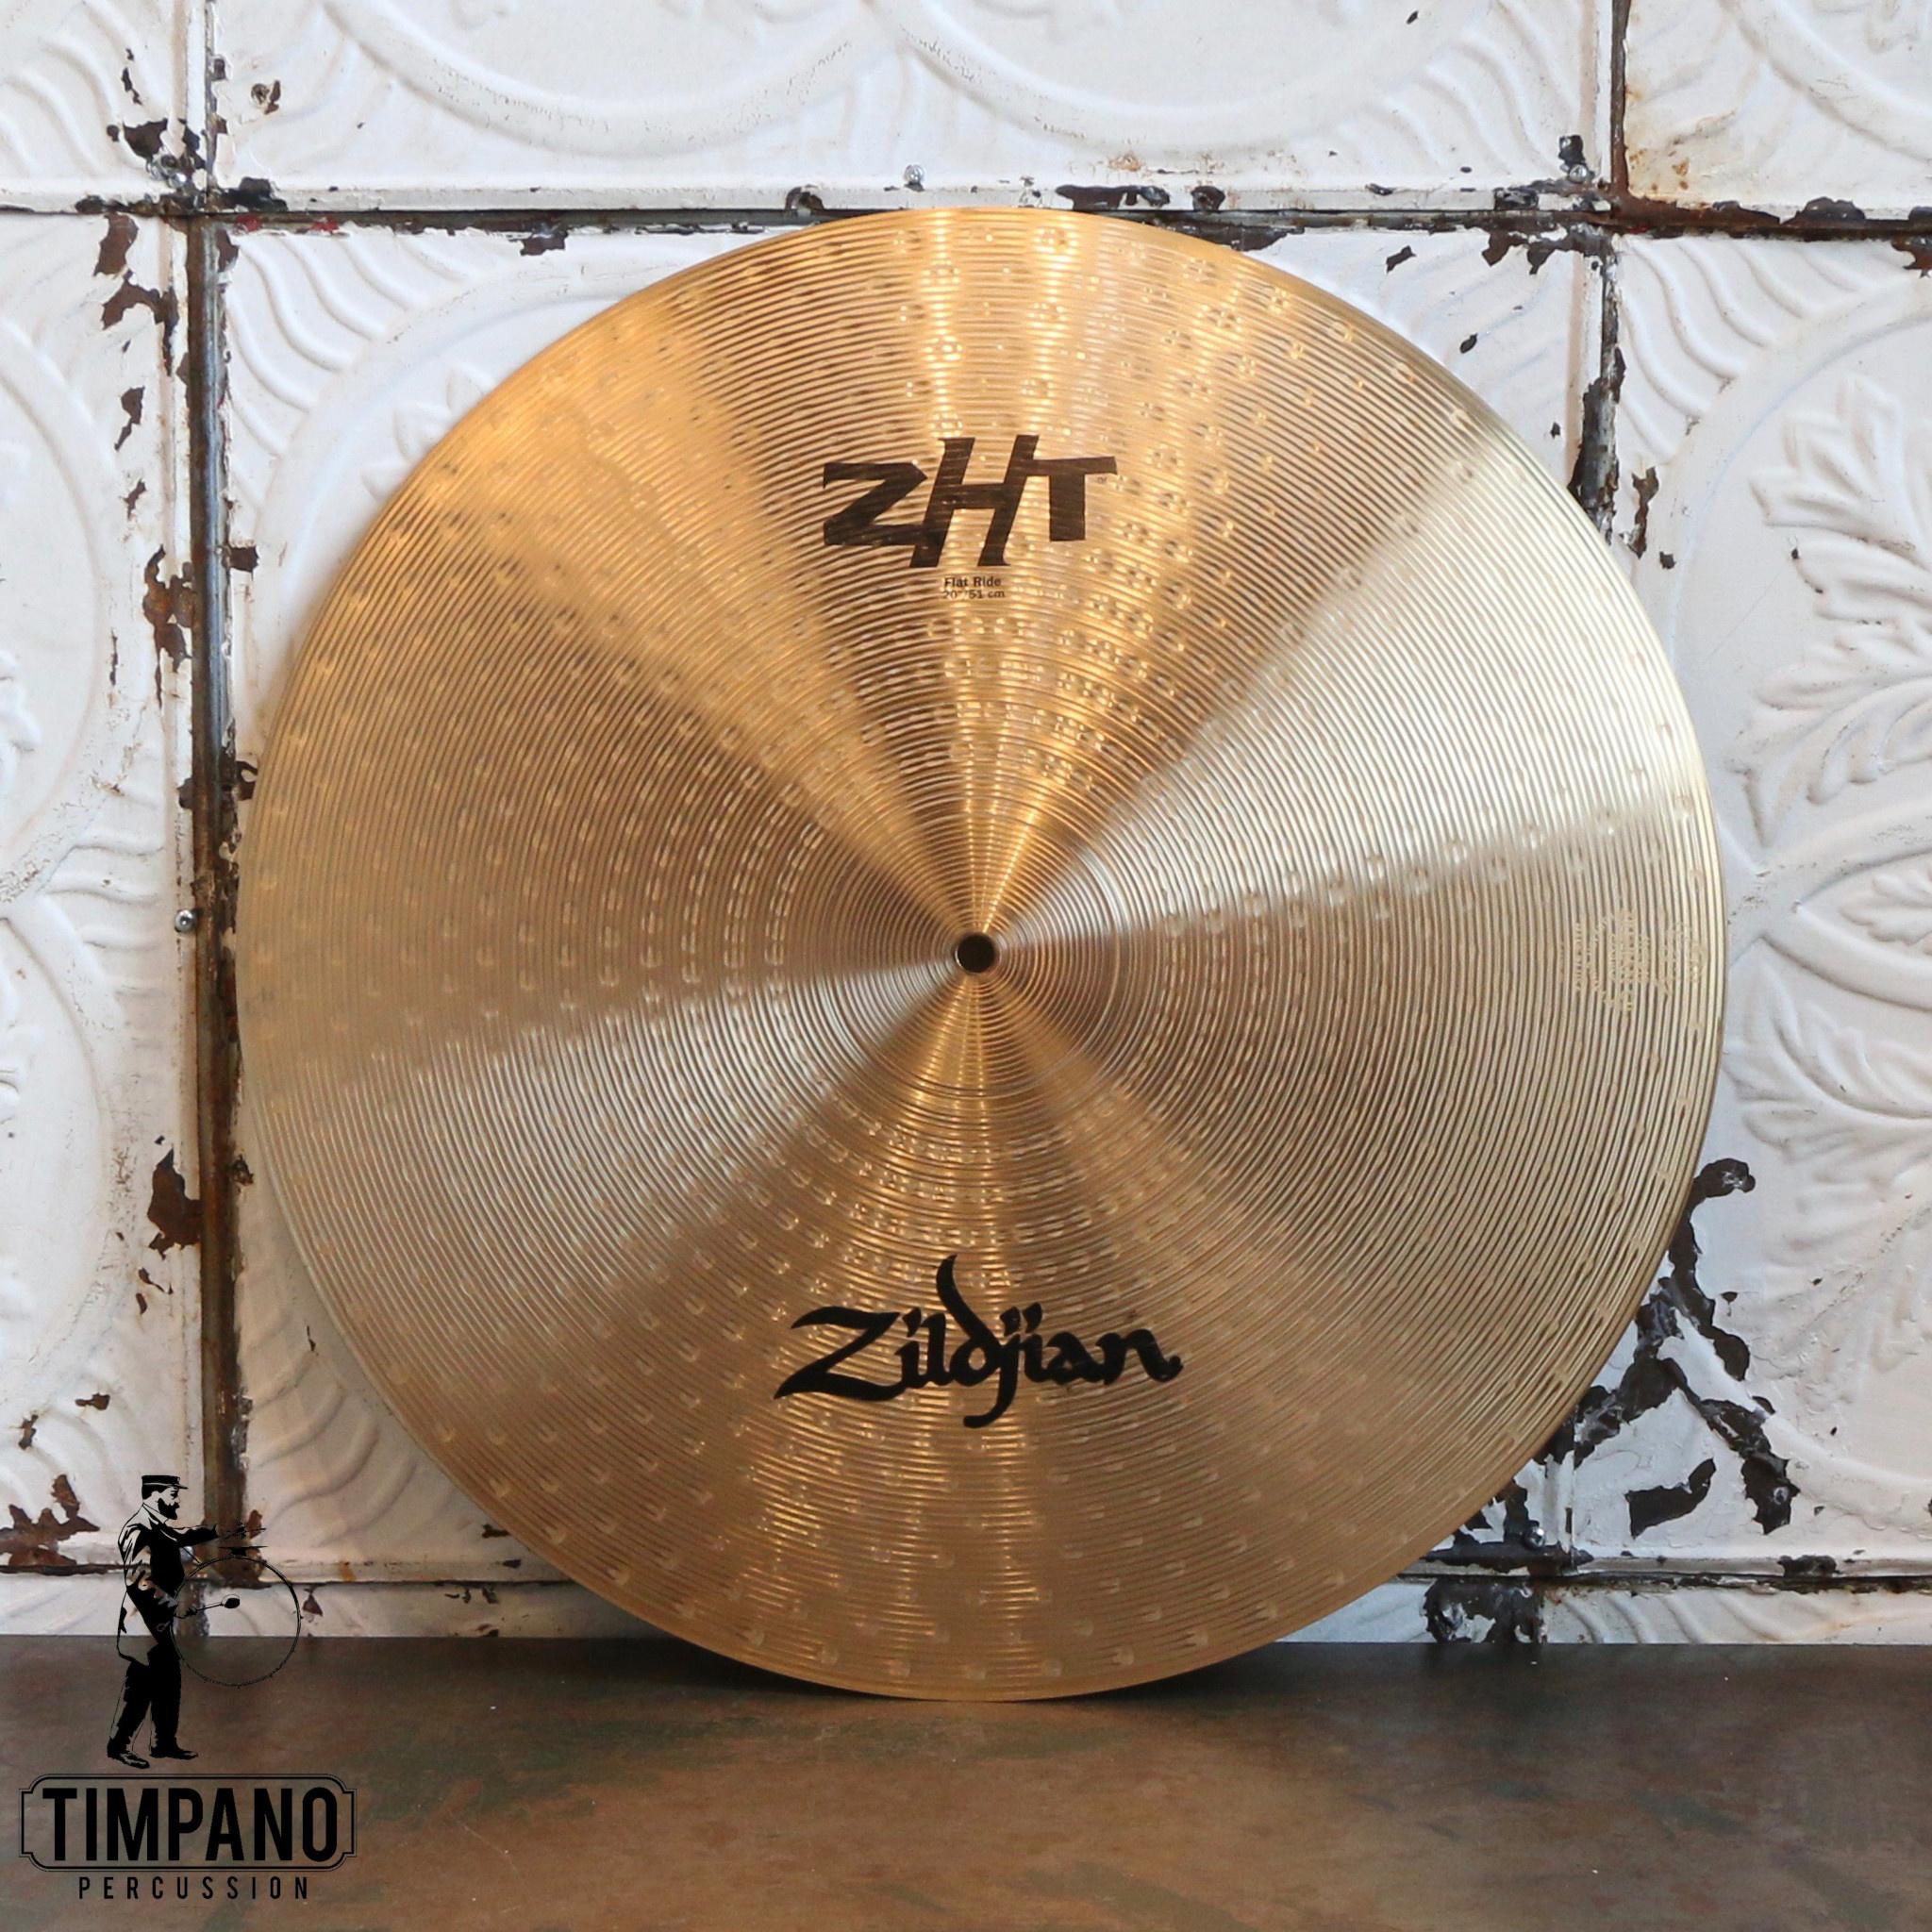 Zildjian Cymbale ride usagée Zildjian ZHT flat 20po